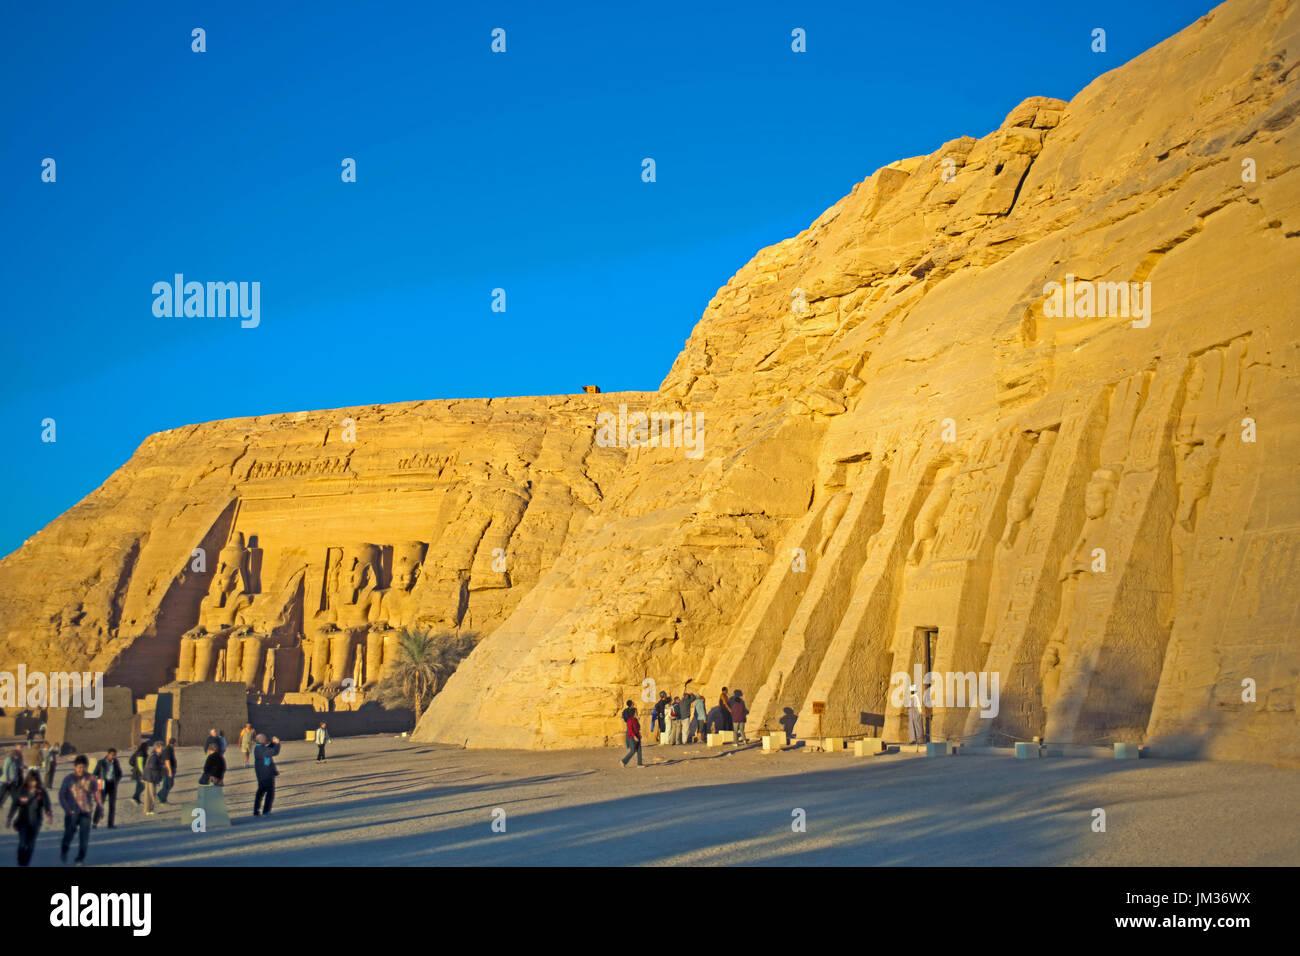 Aegypten, Abu Simbel, hathortempel der Nefertari, der Lieblingsfrau von Ramses II., links dahinter der Grosse Tempel Stockbild